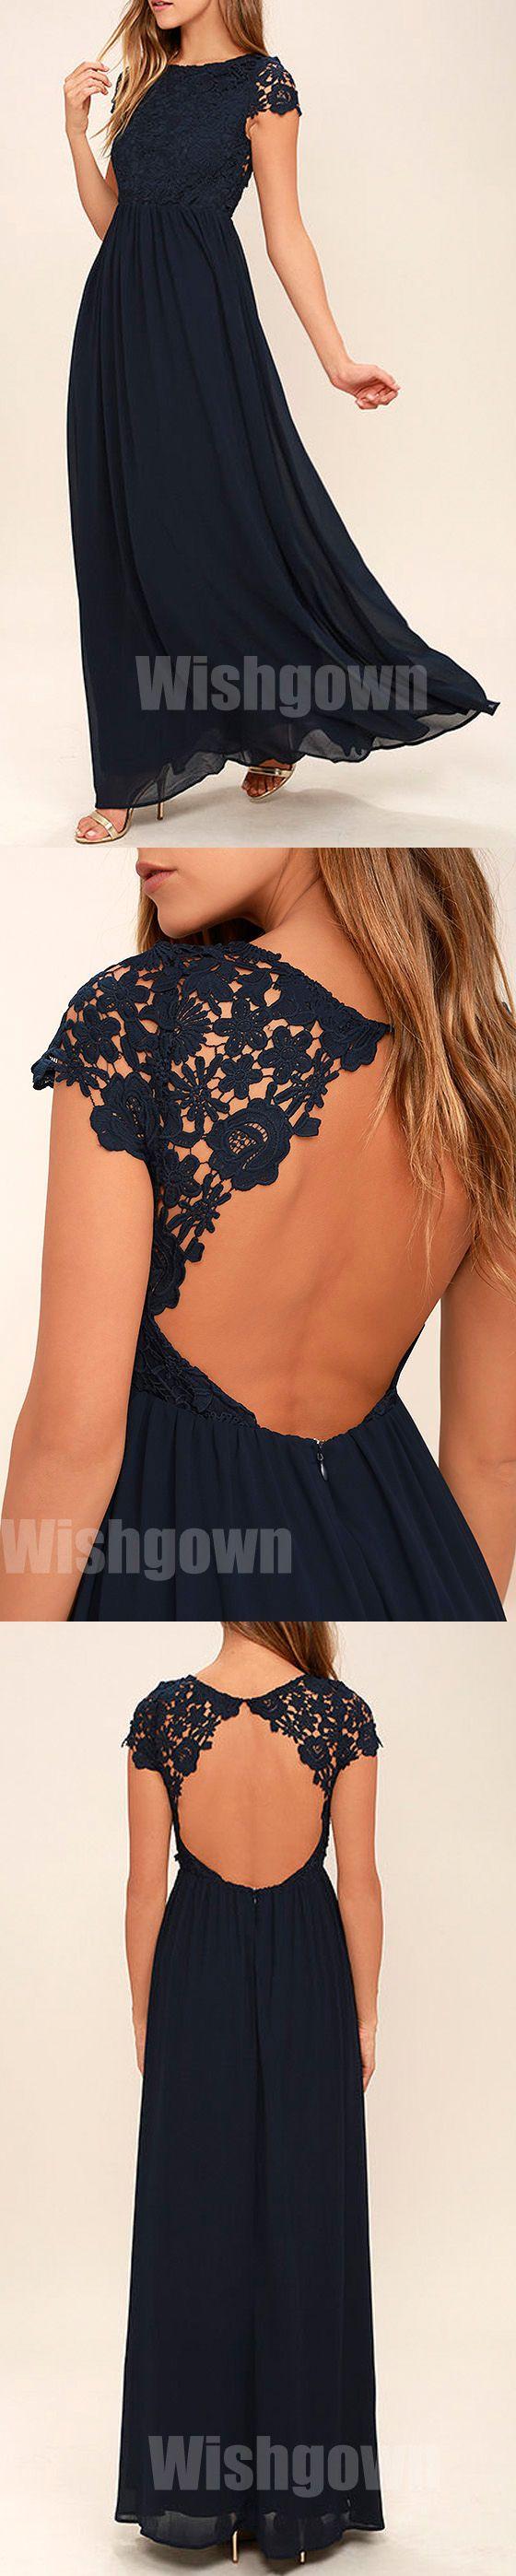 Cap Sleeves Navy Blue Lace Top Chiffon Backless Long Bridesmaid Dresses, WG466 #bridesmaids #wedding #weddingpartydress